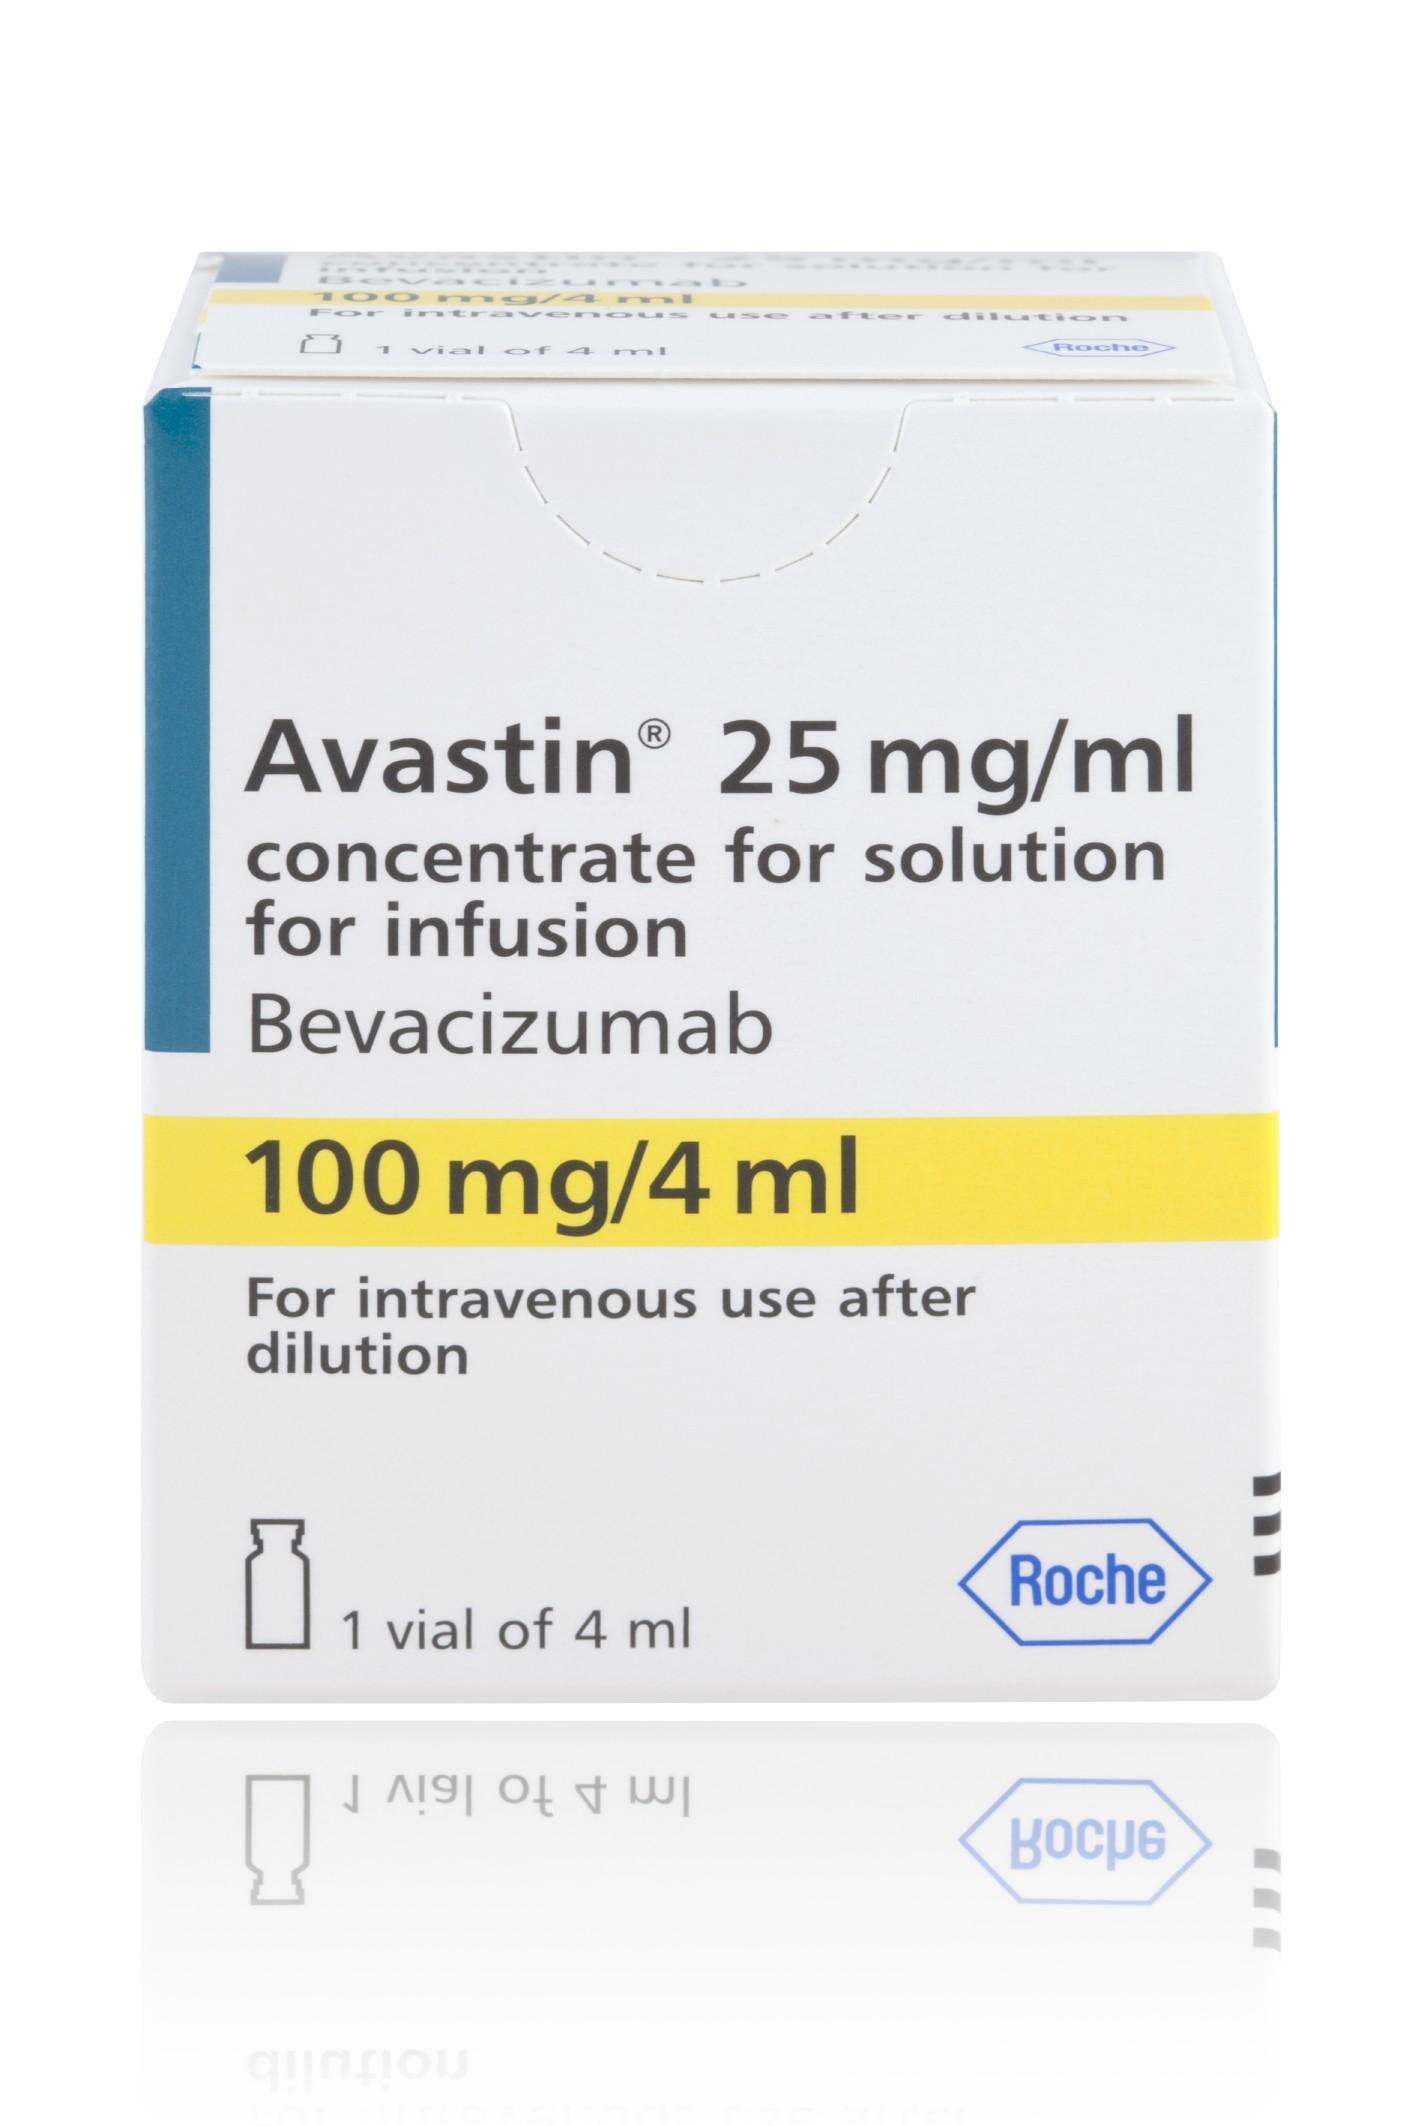 Avastin Click image to enlarge